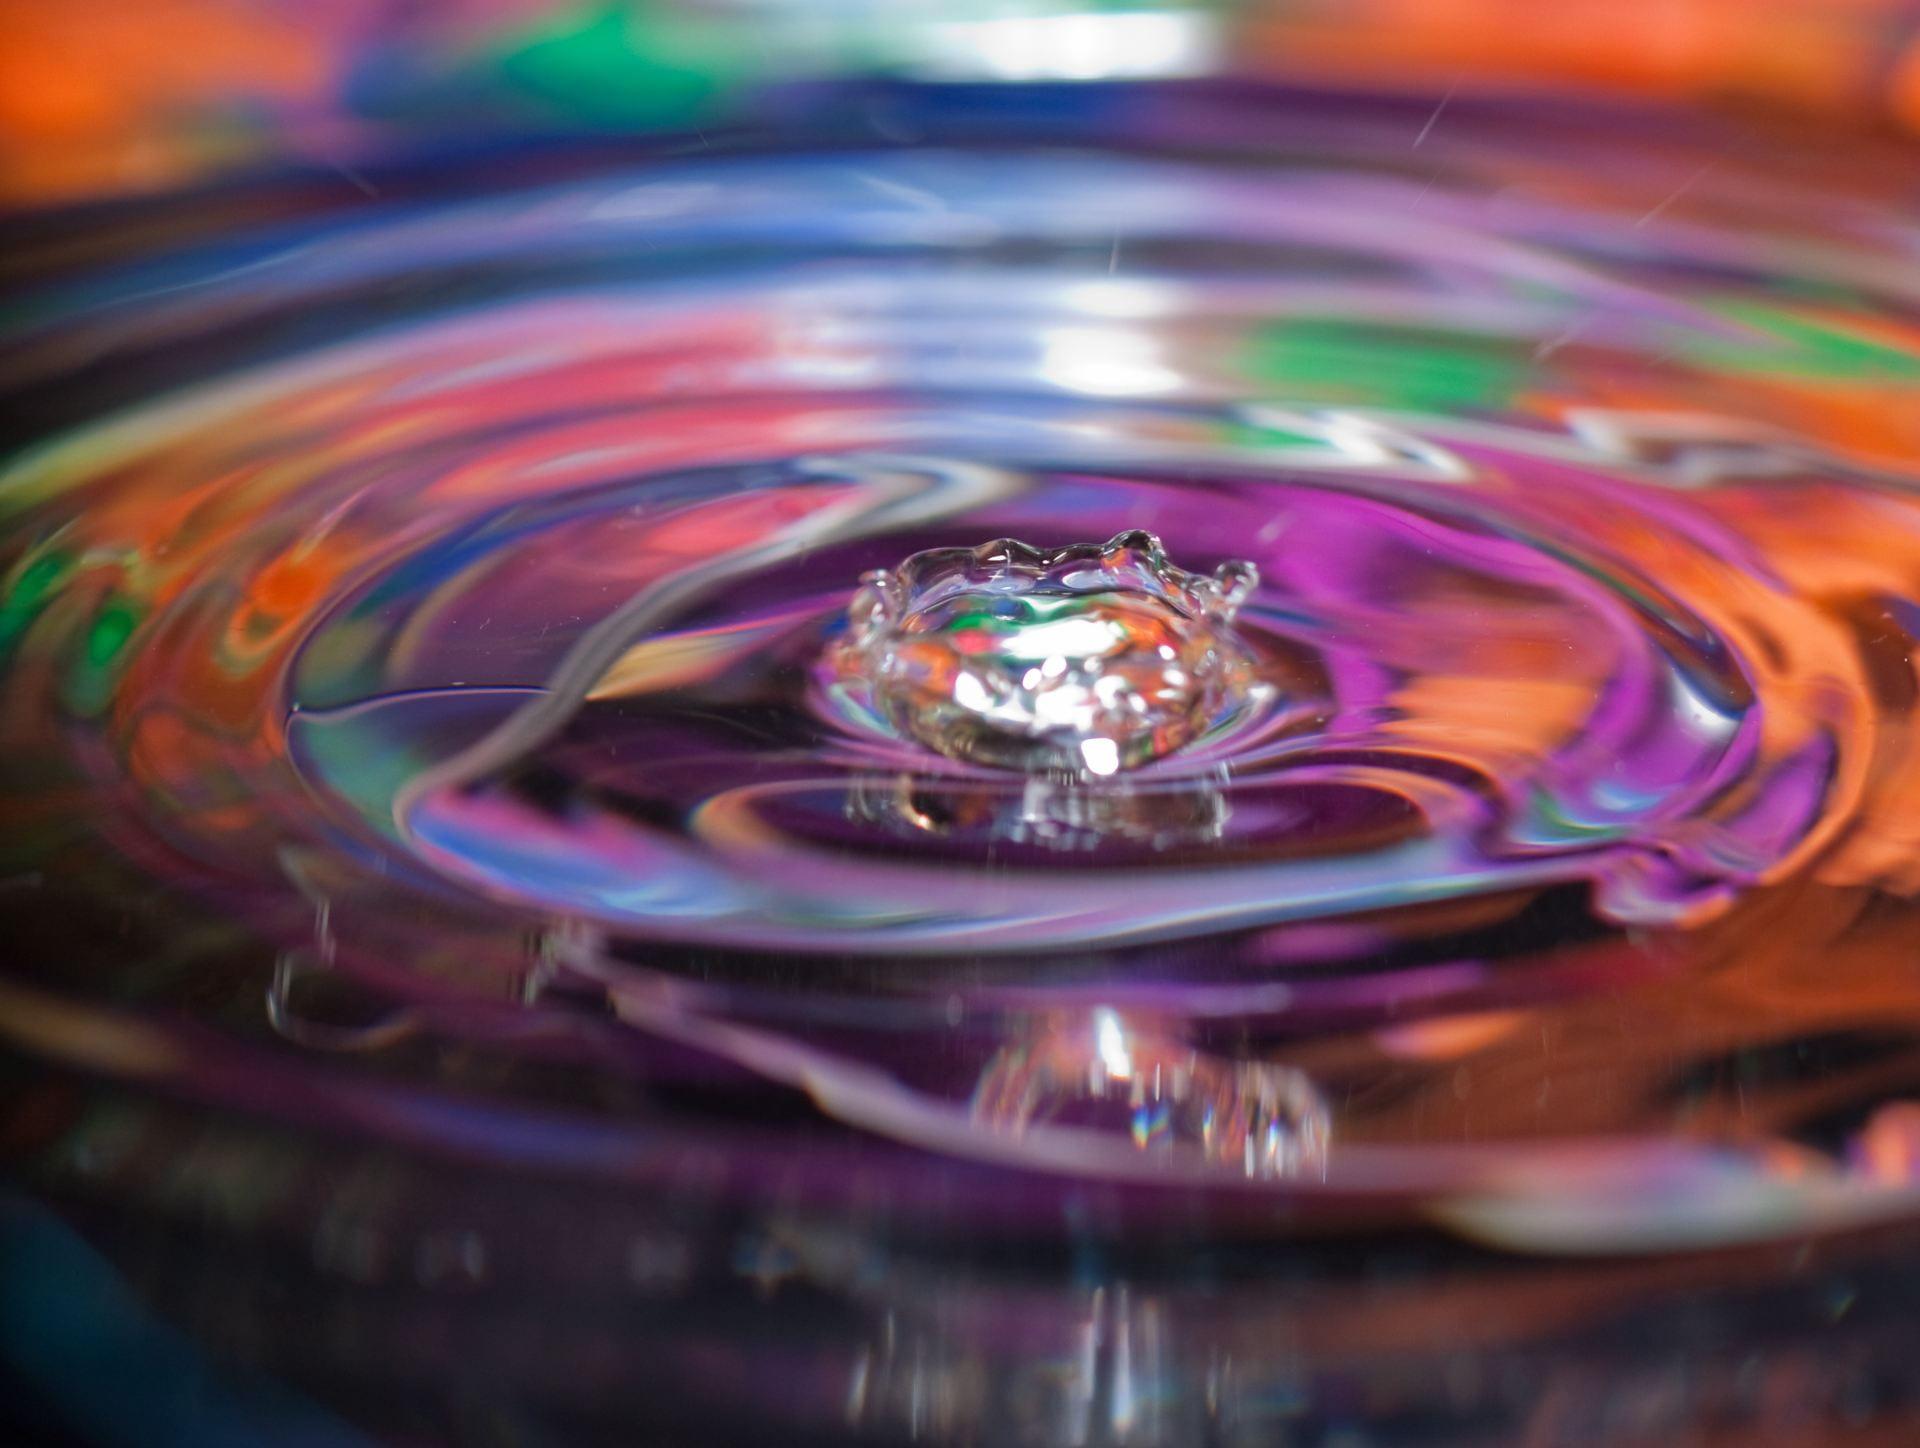 Water ripple in multicolors